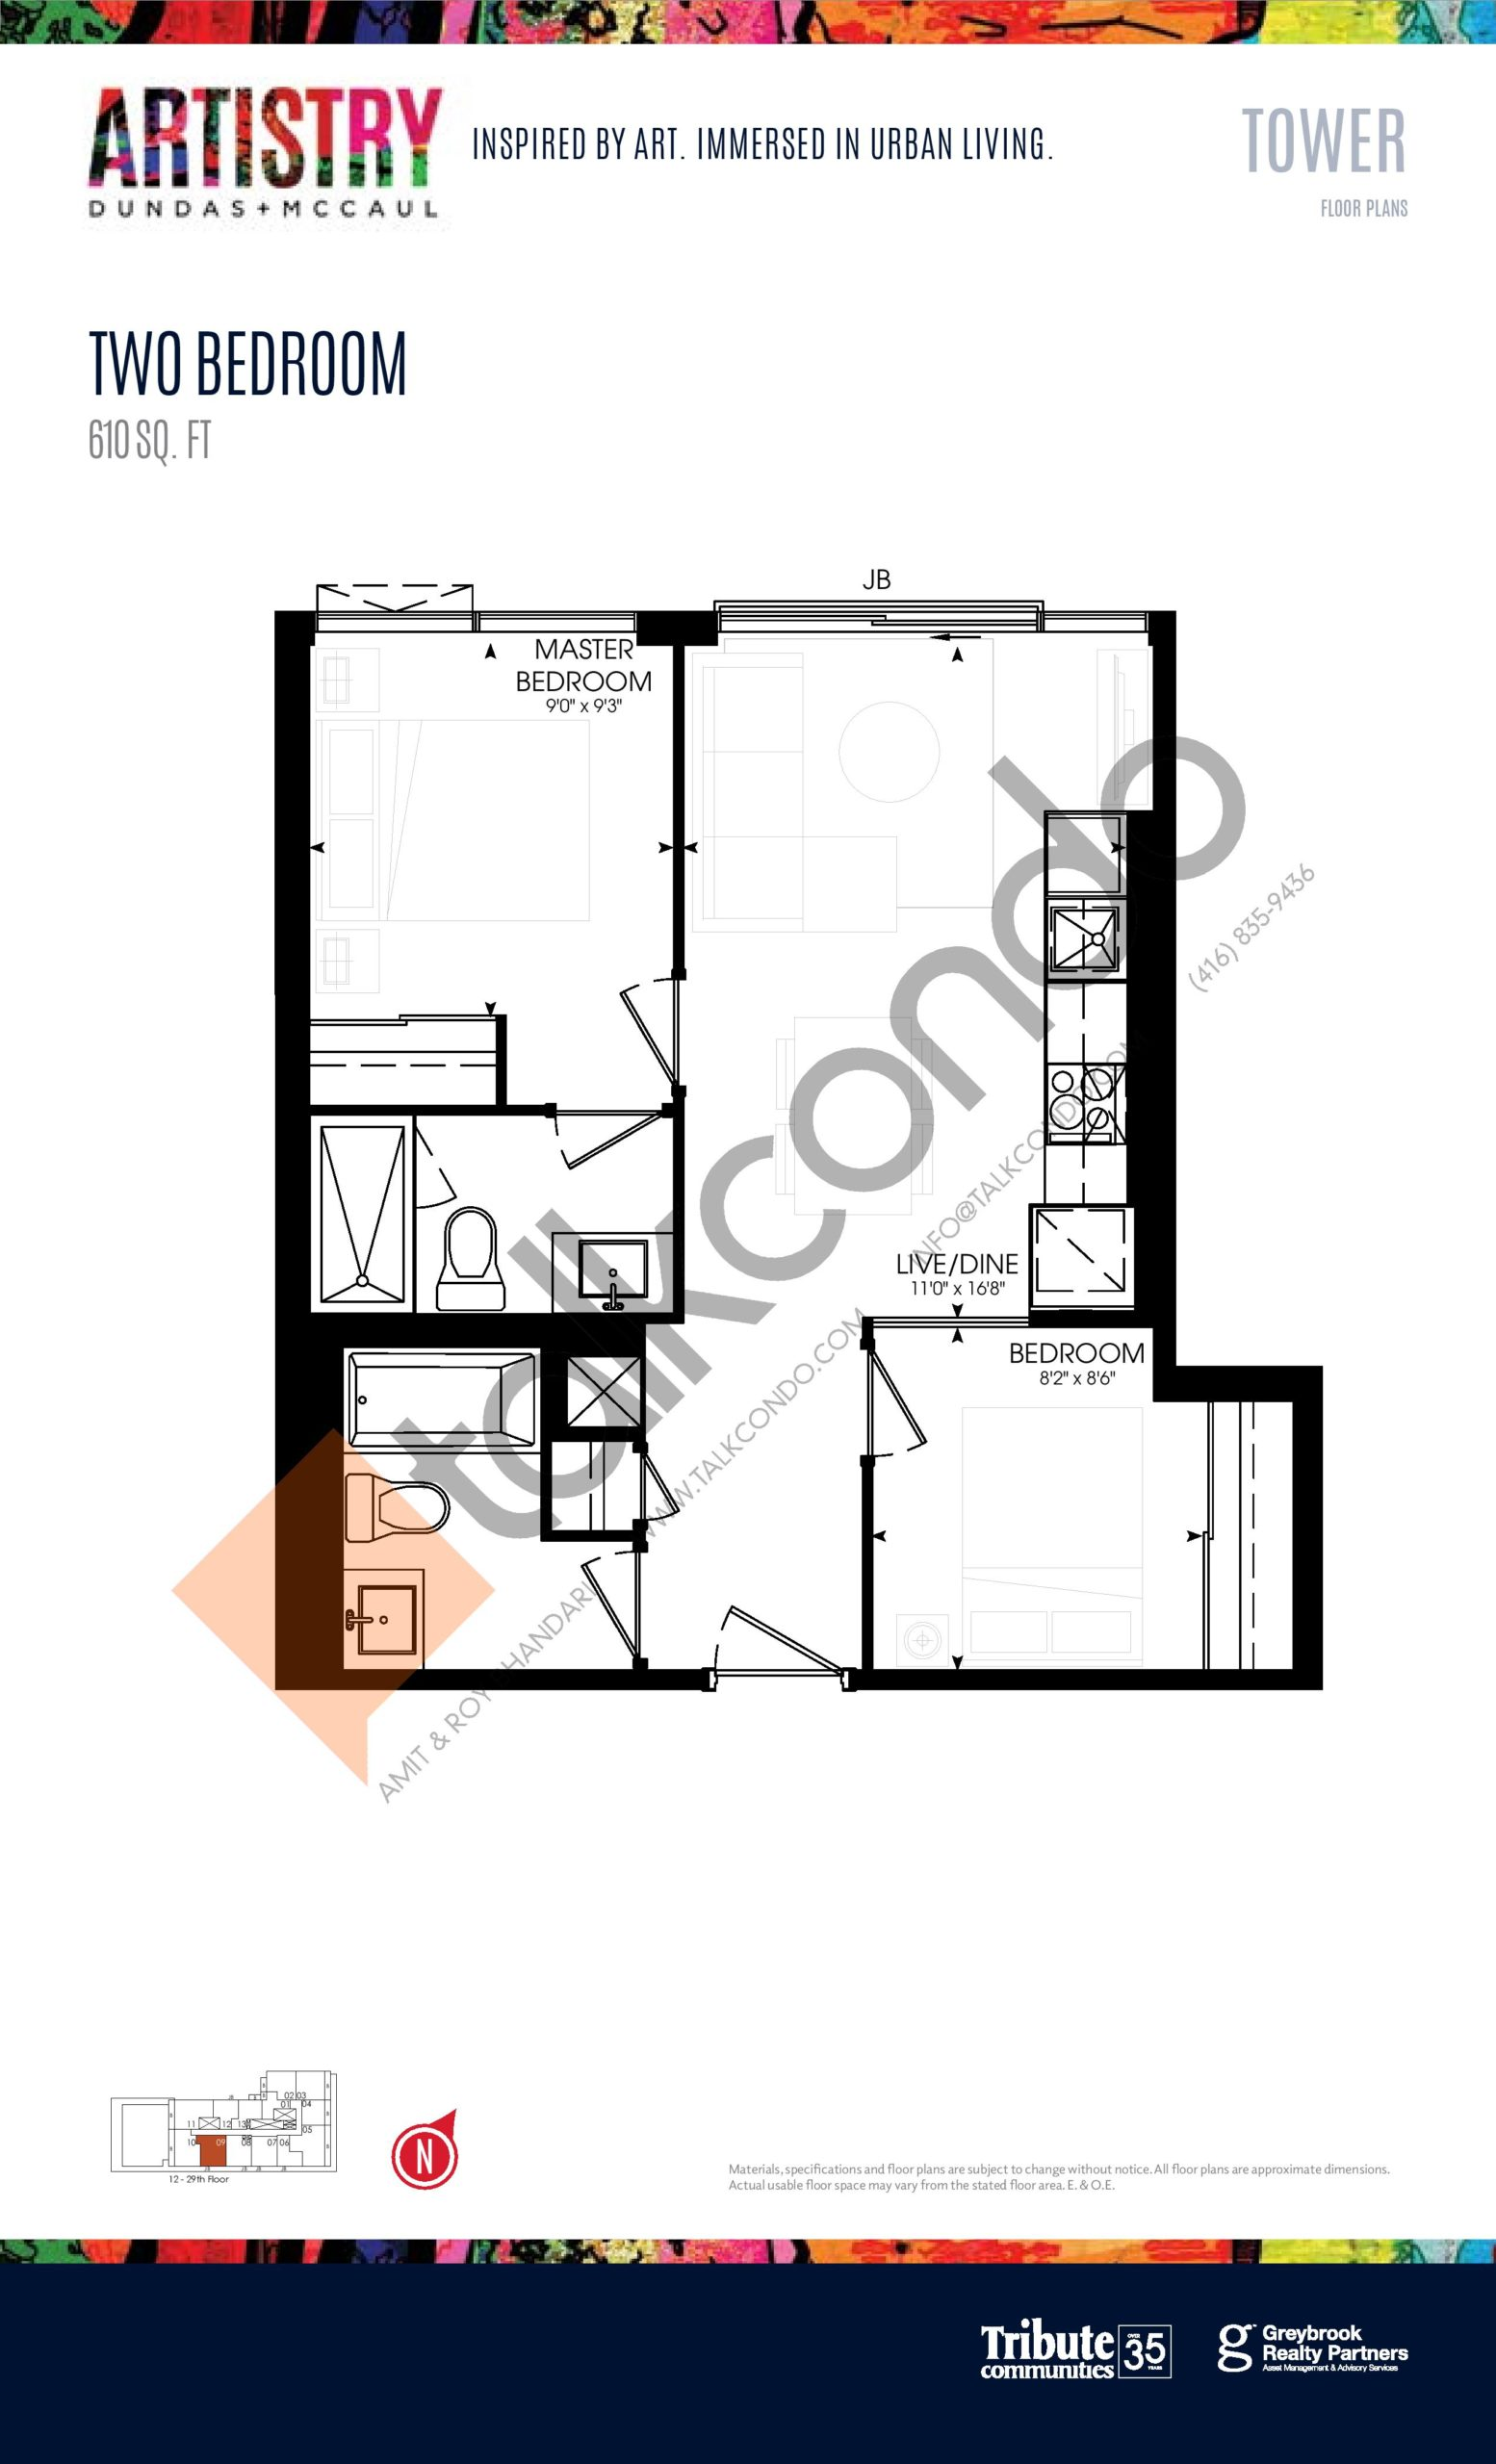 610 sq. ft. - Tower Floor Plan at Artistry Condos - 610 sq.ft